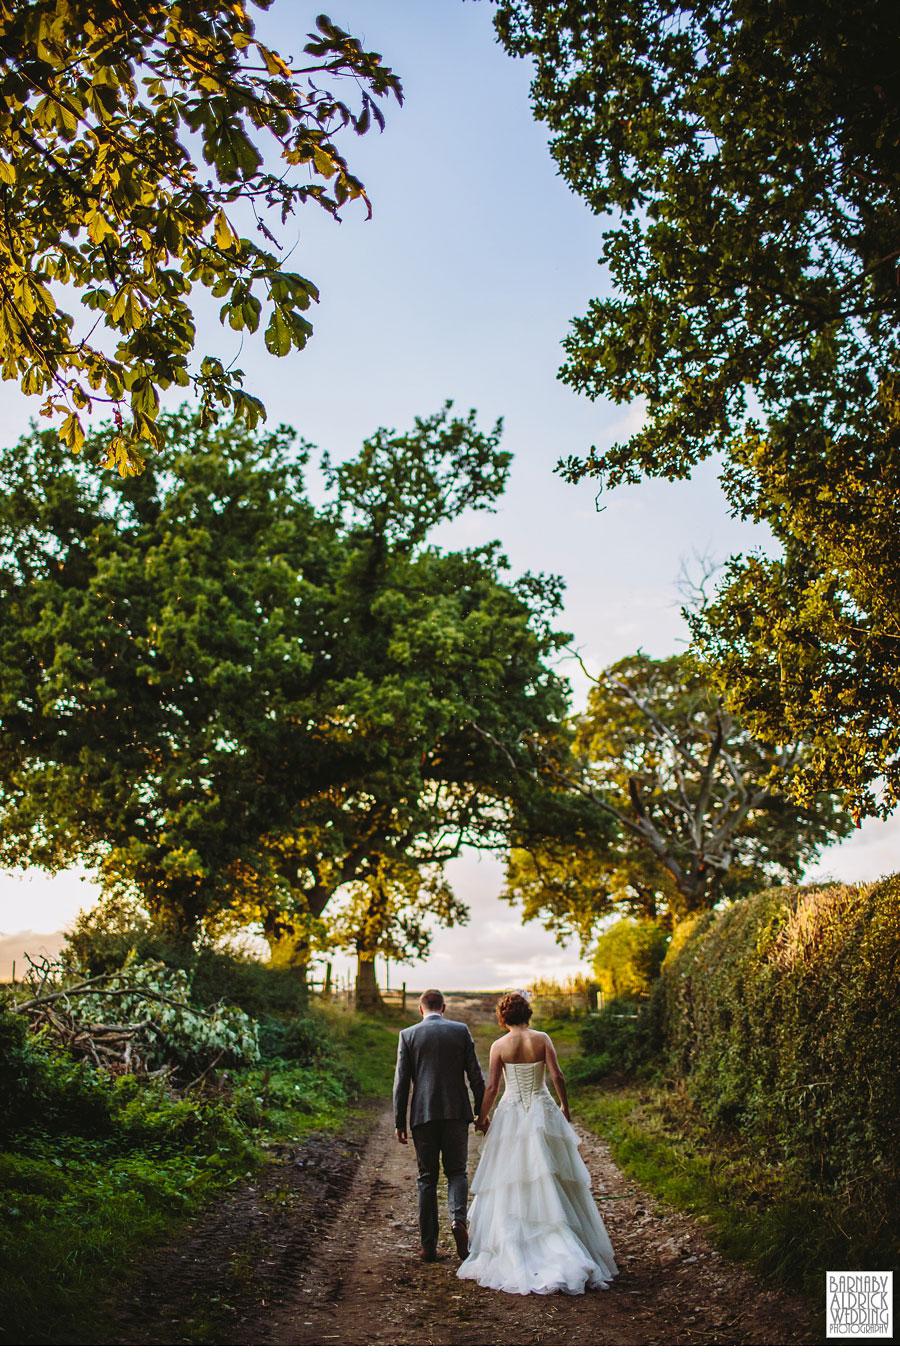 Thorner Village Hall Leeds Wedding Photography by Yorkshire Wedding Photographer Barnaby Aldrick 059